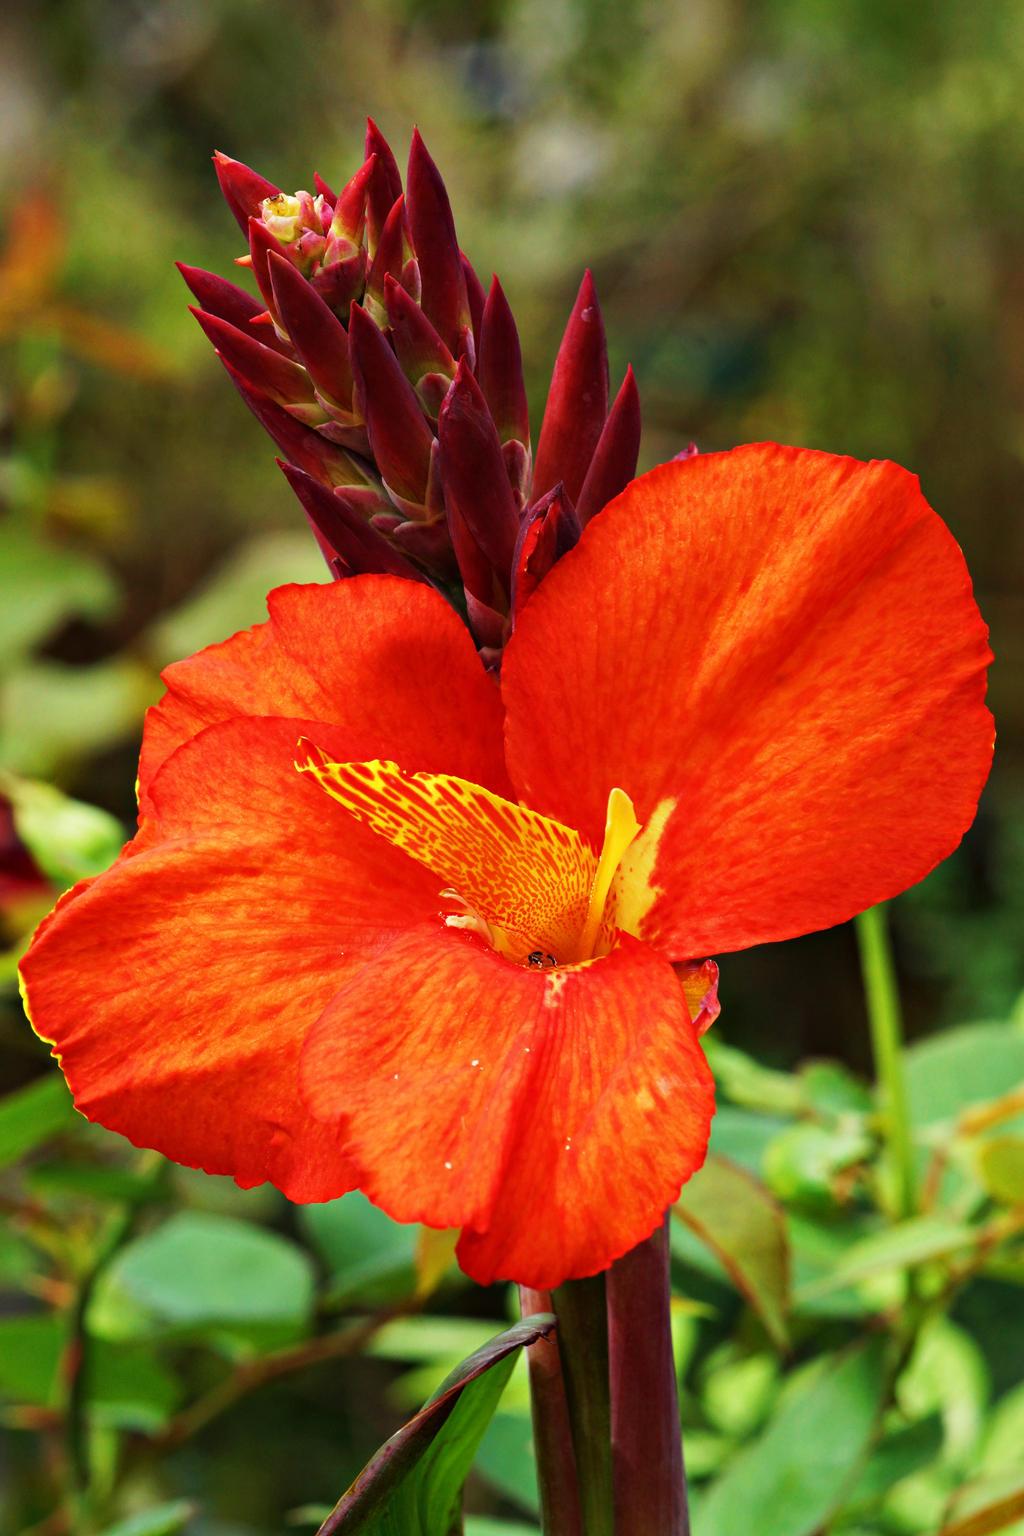 Canna lily flower 3 by a6 k on DeviantArt